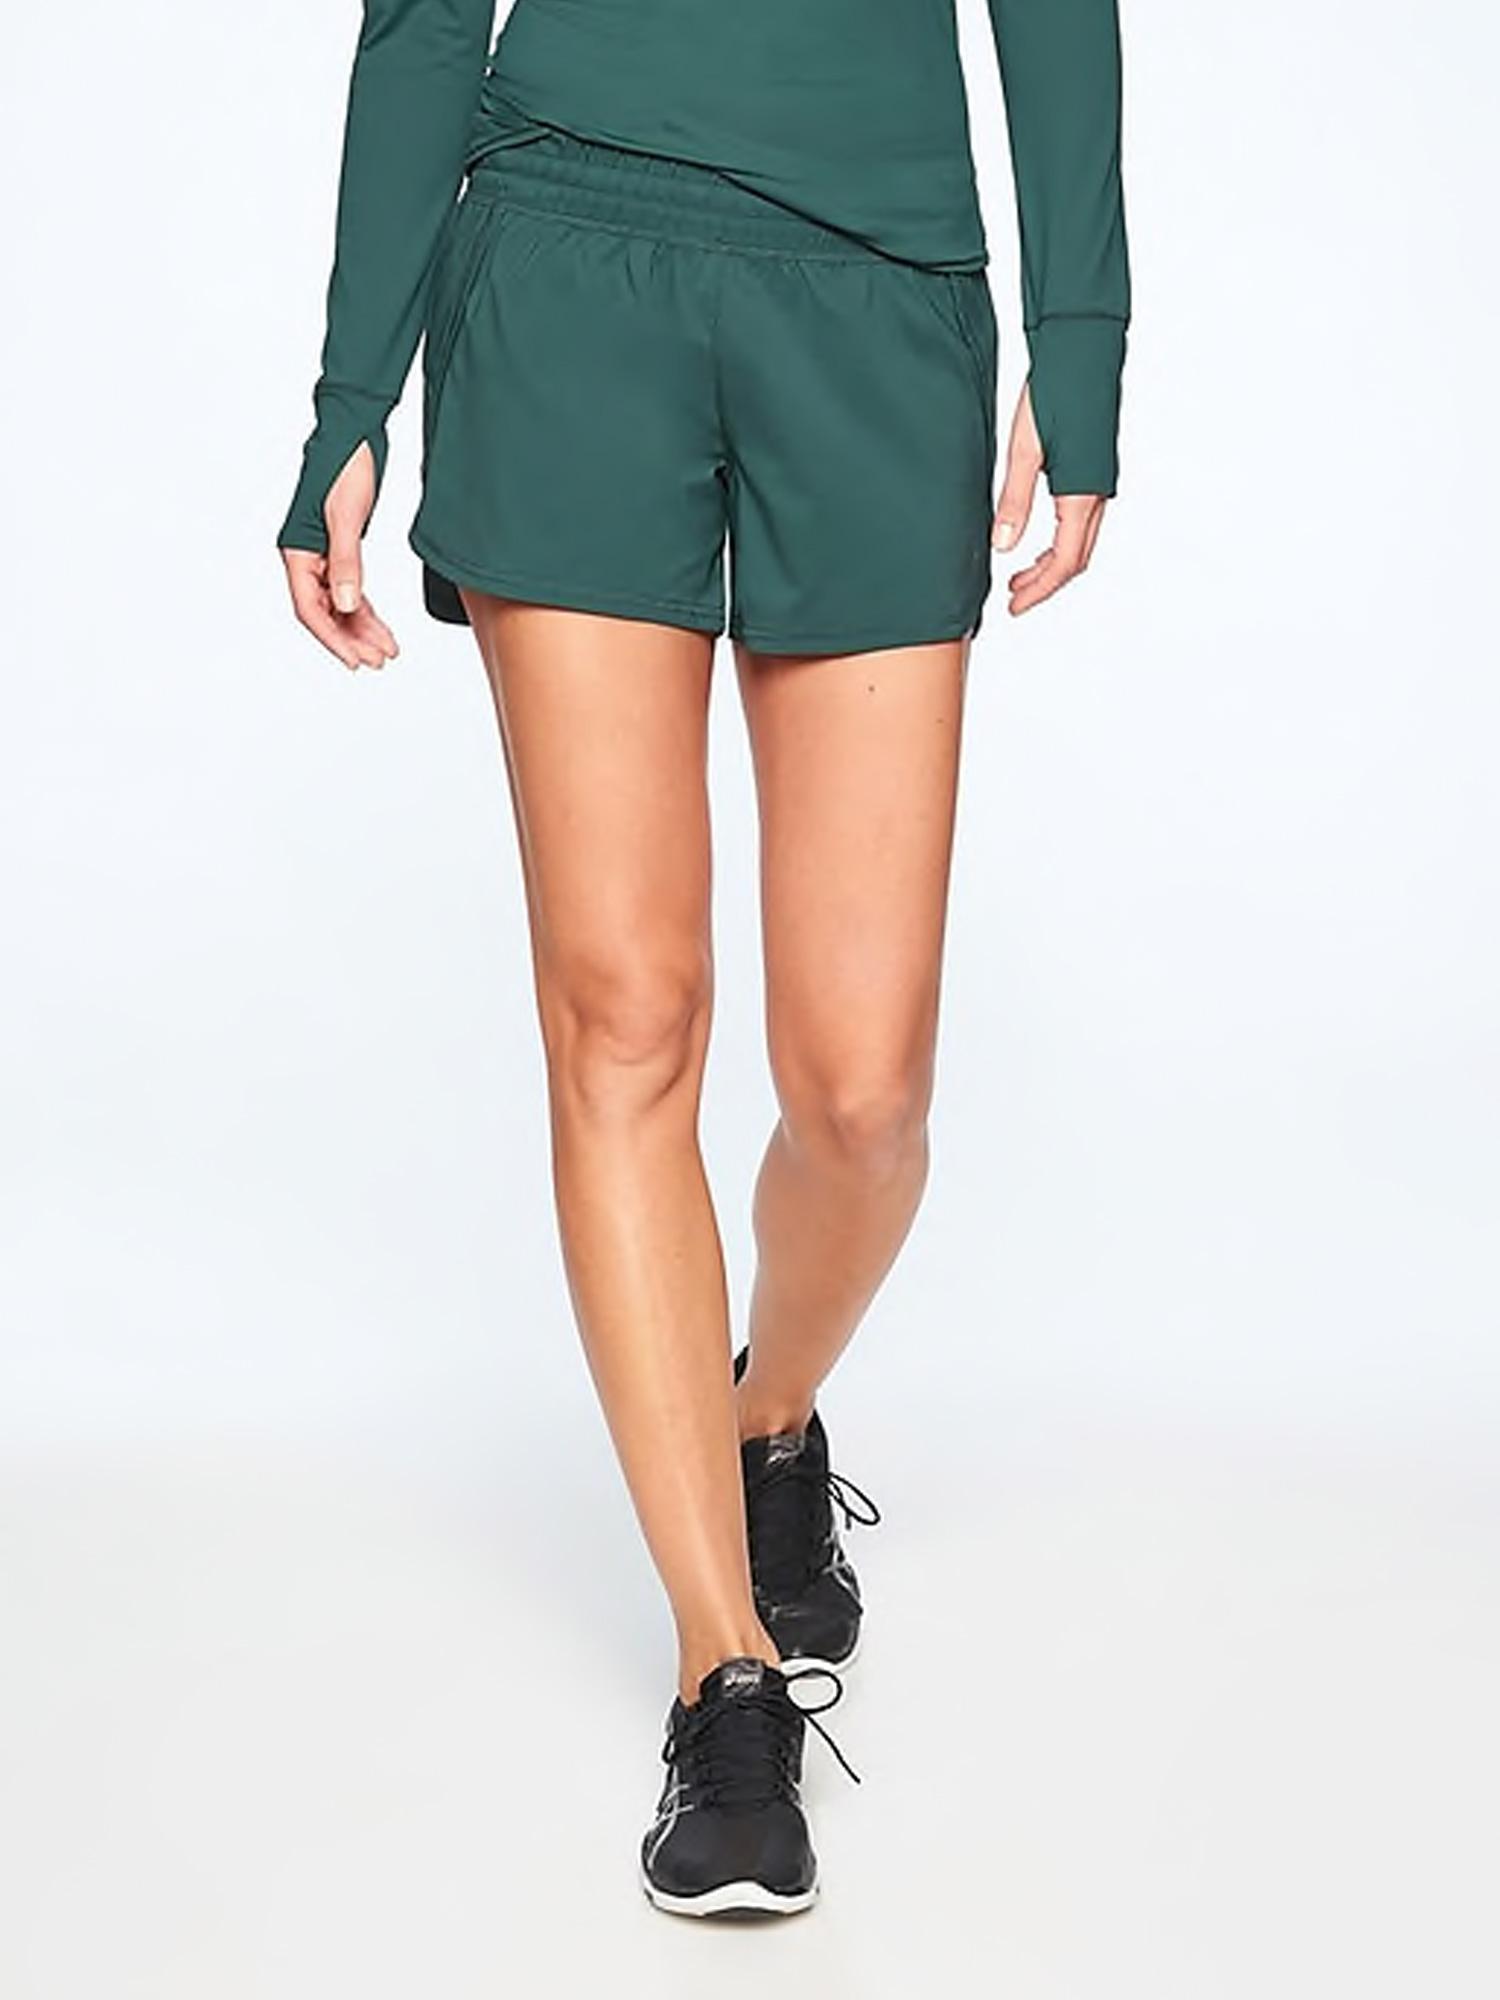 Athleta Shorts - $39